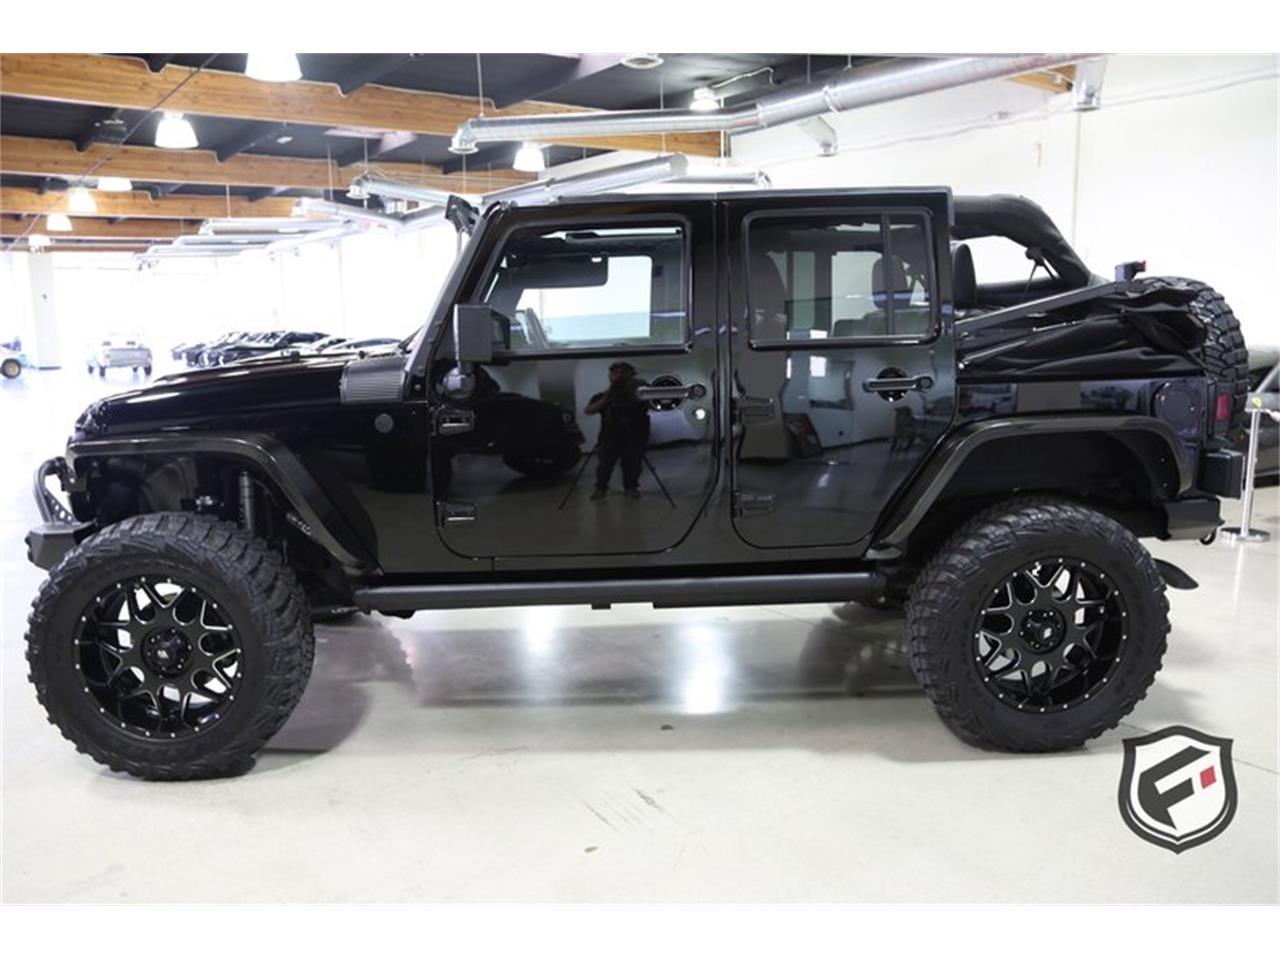 2013 Jeep Wrangler (CC-1224875) for sale in Chatsworth, California